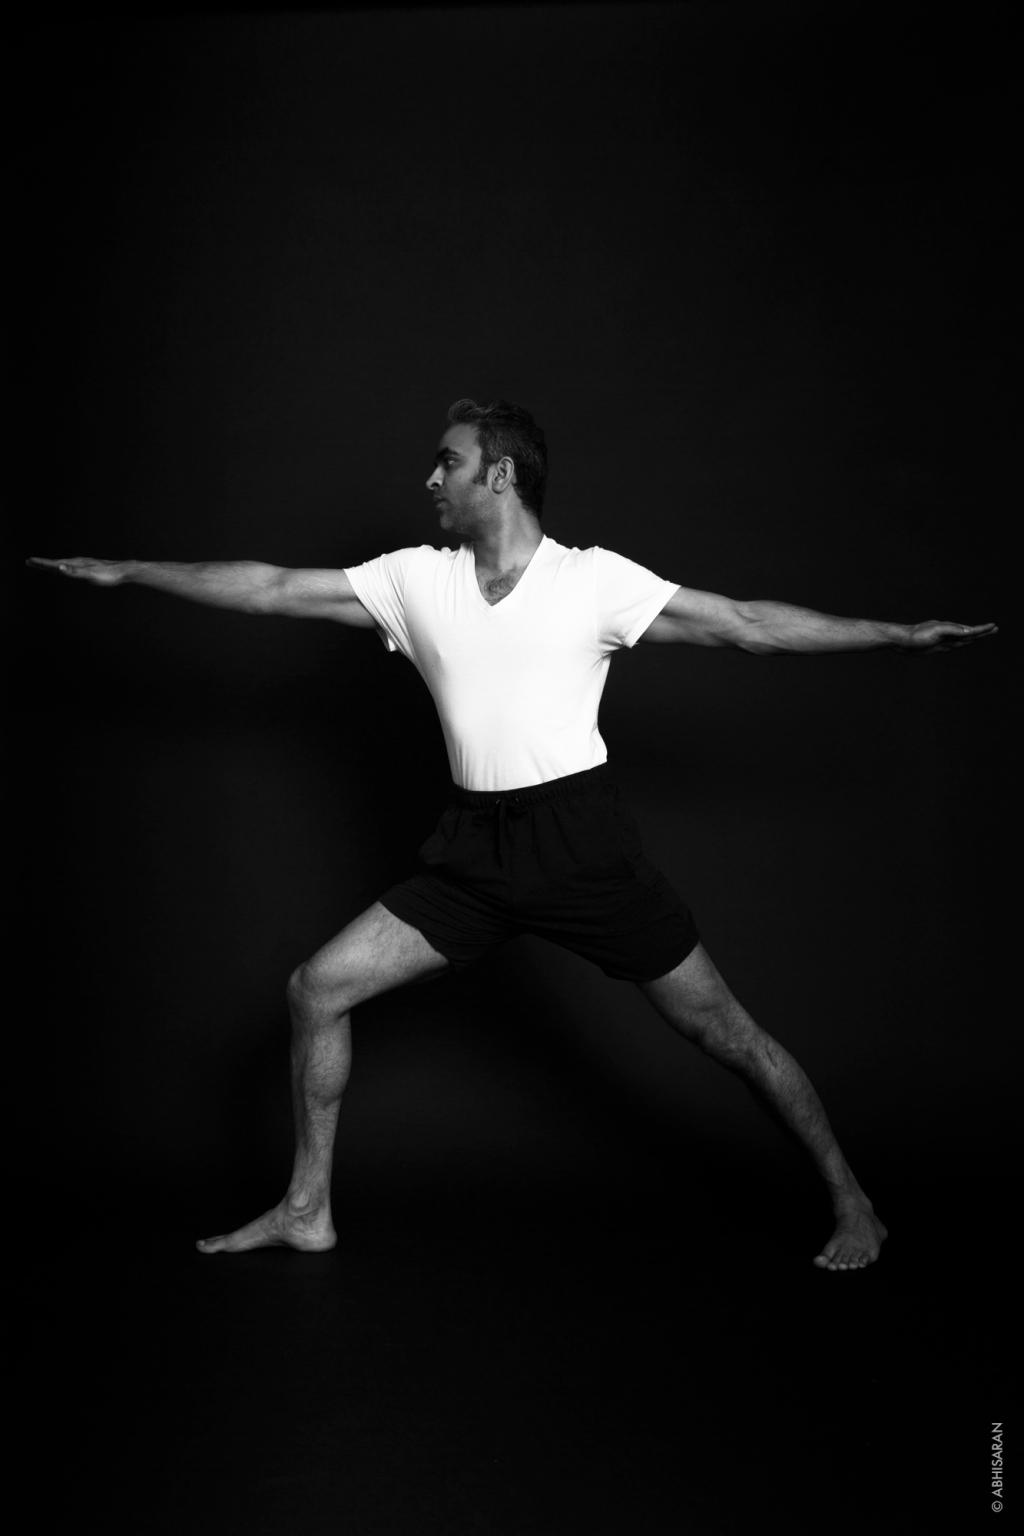 Virabhadrasana ou posture de guerrier